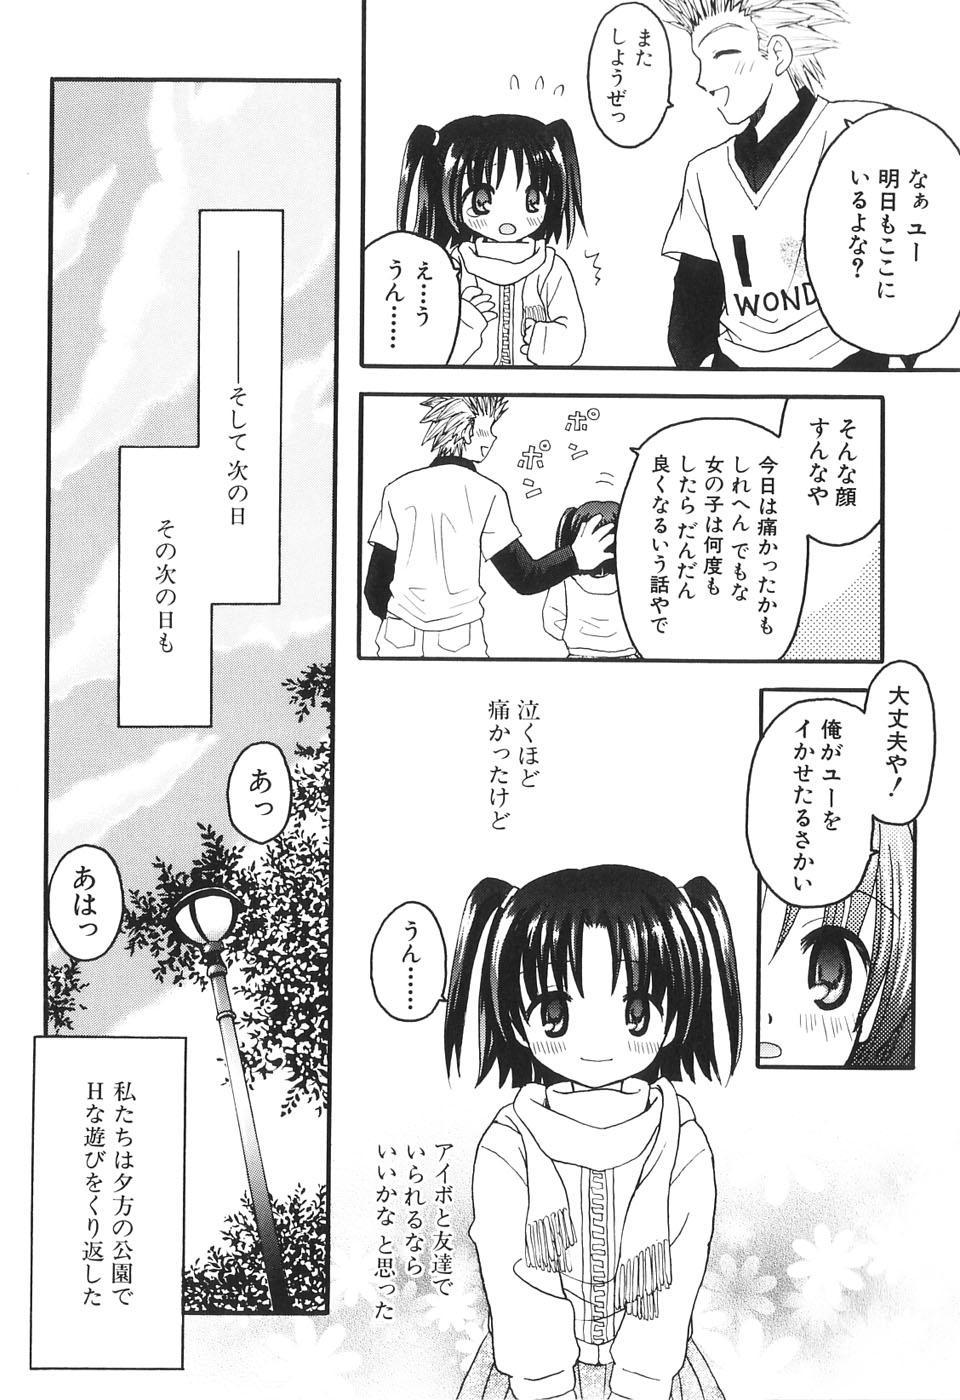 Musoubana 31